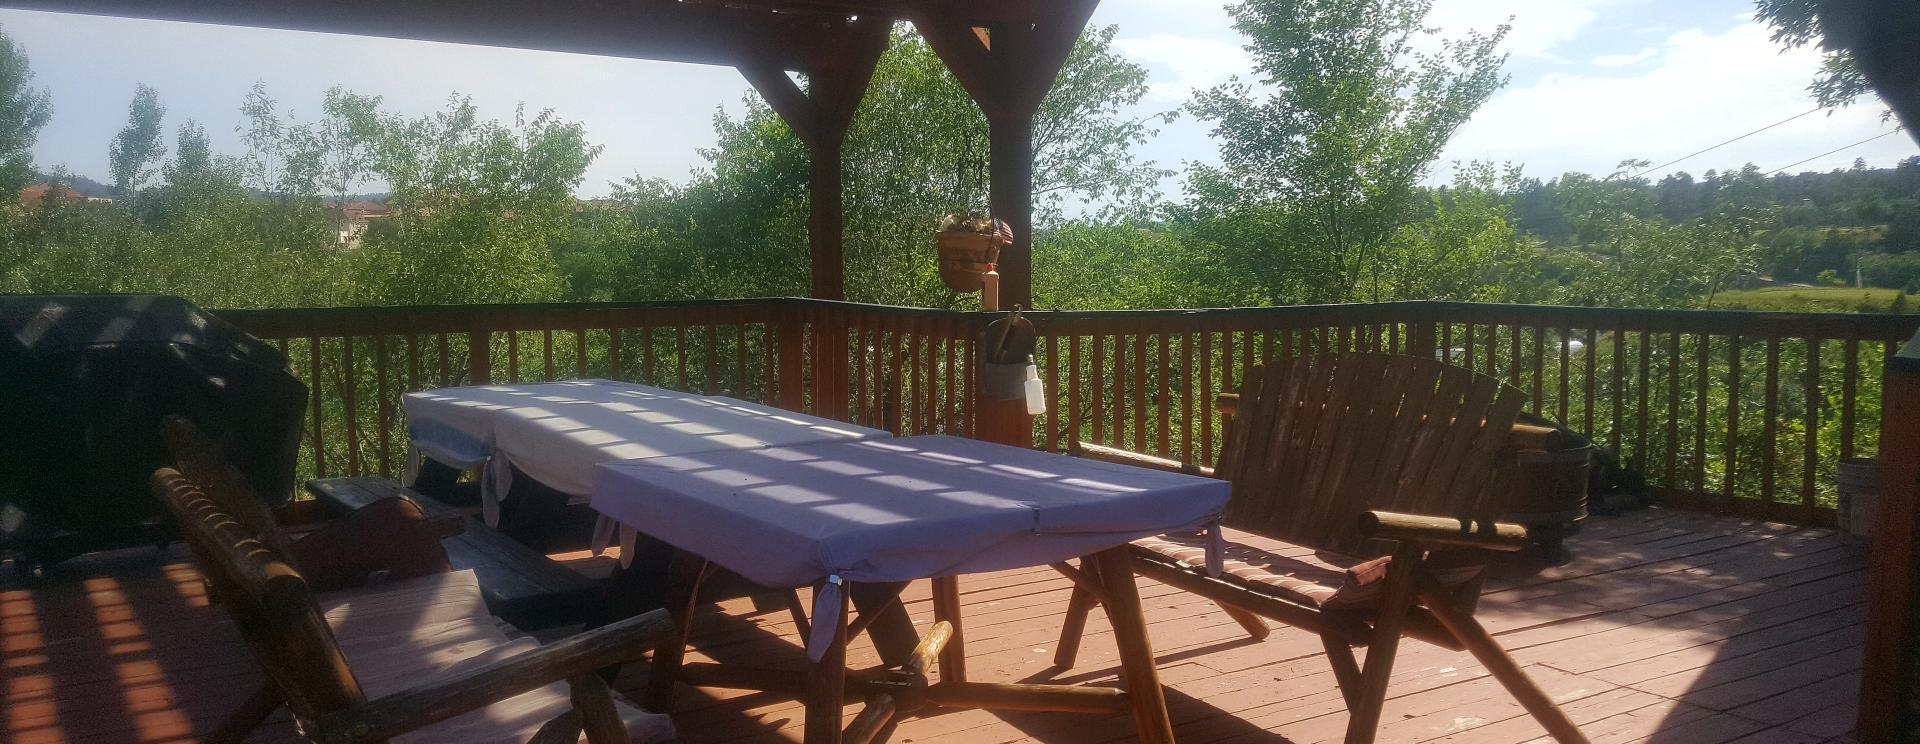 Historic Log Cabin Motel